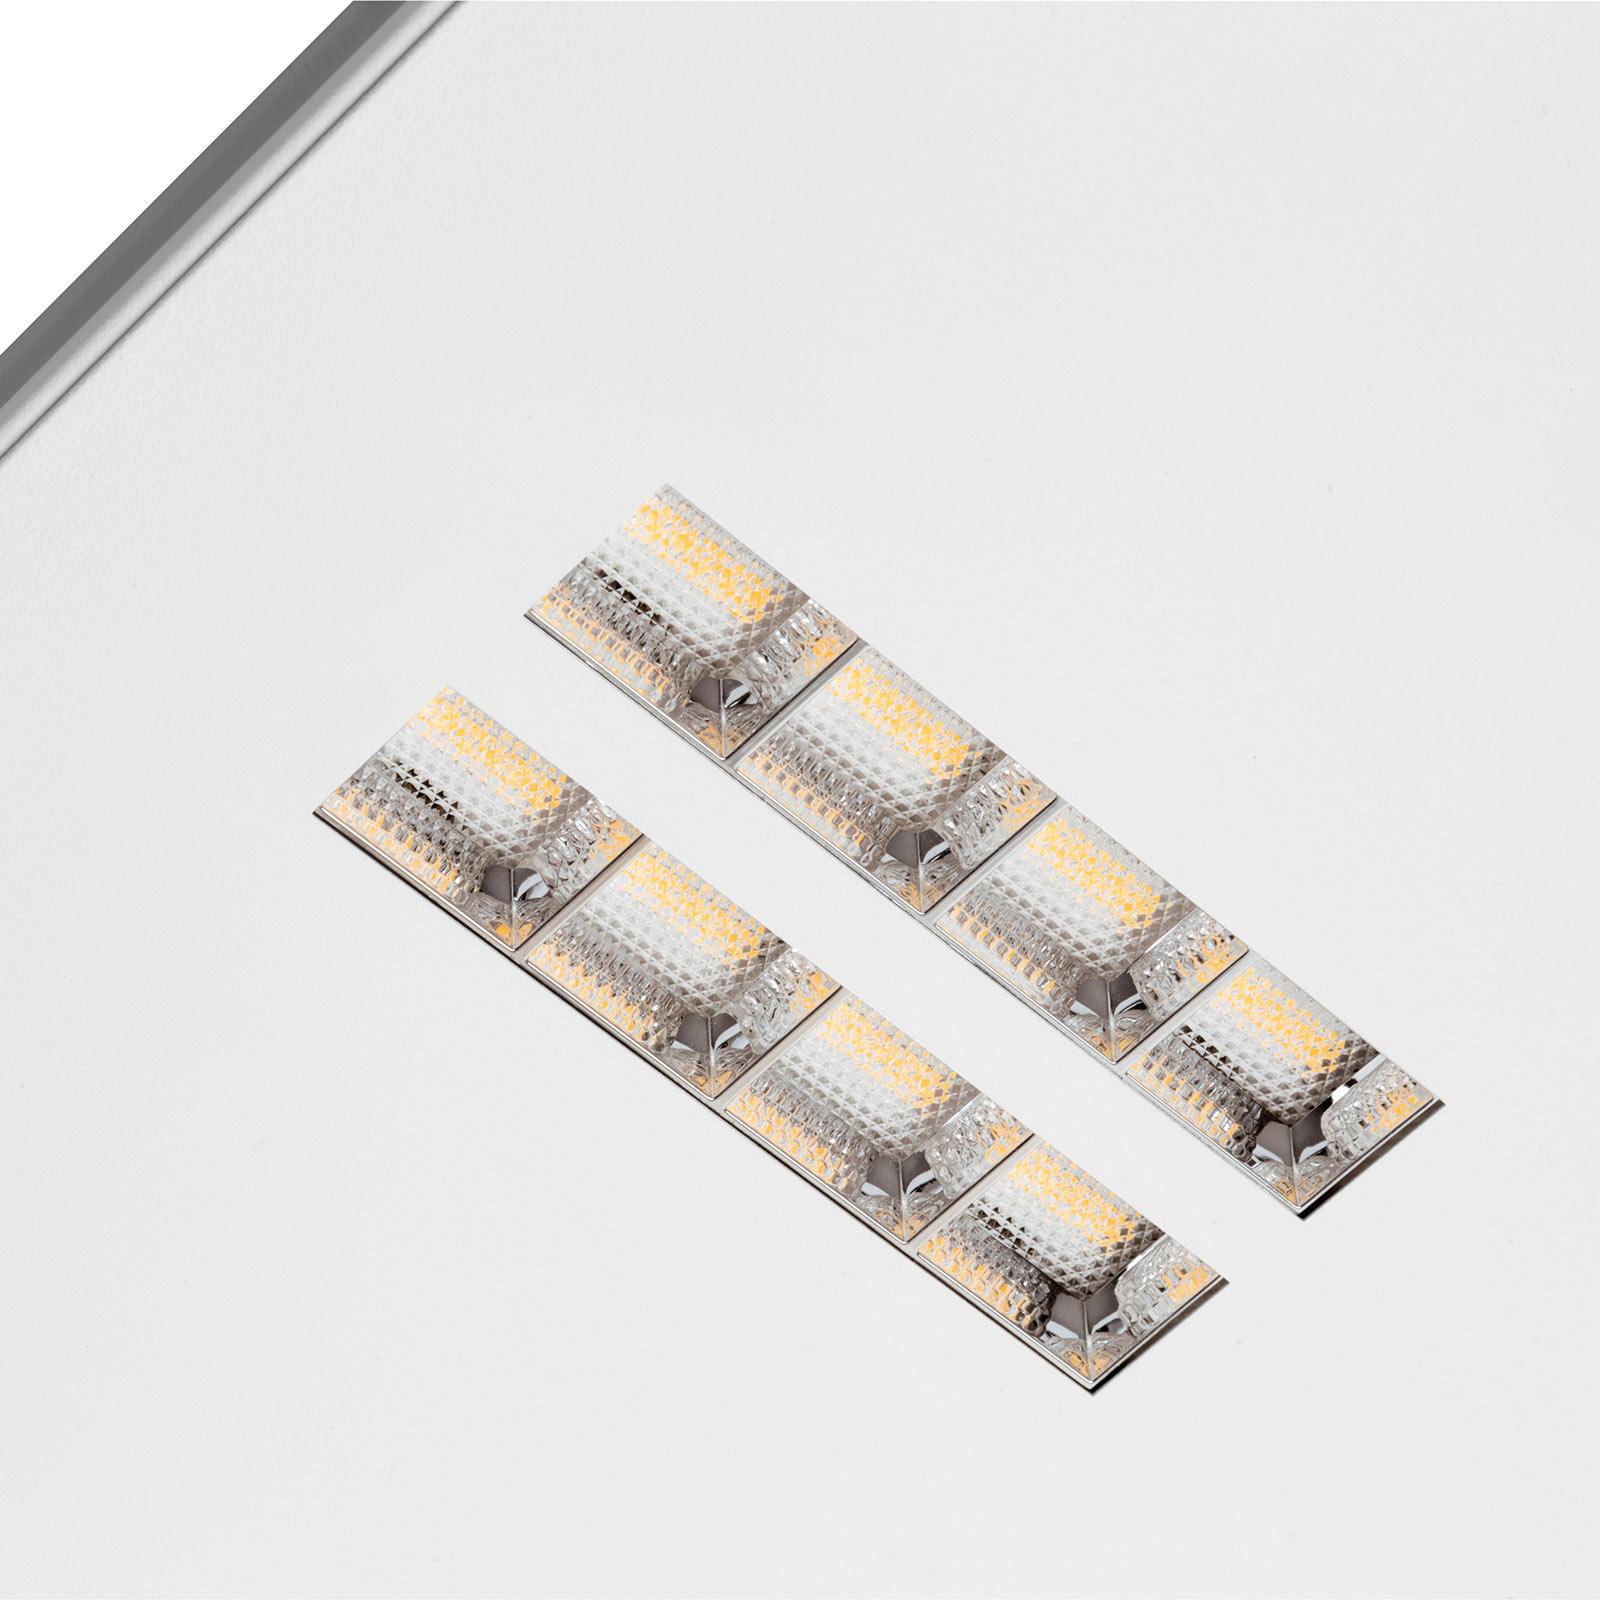 LED-paneeli Declan Recessed PB1 33W 3000K